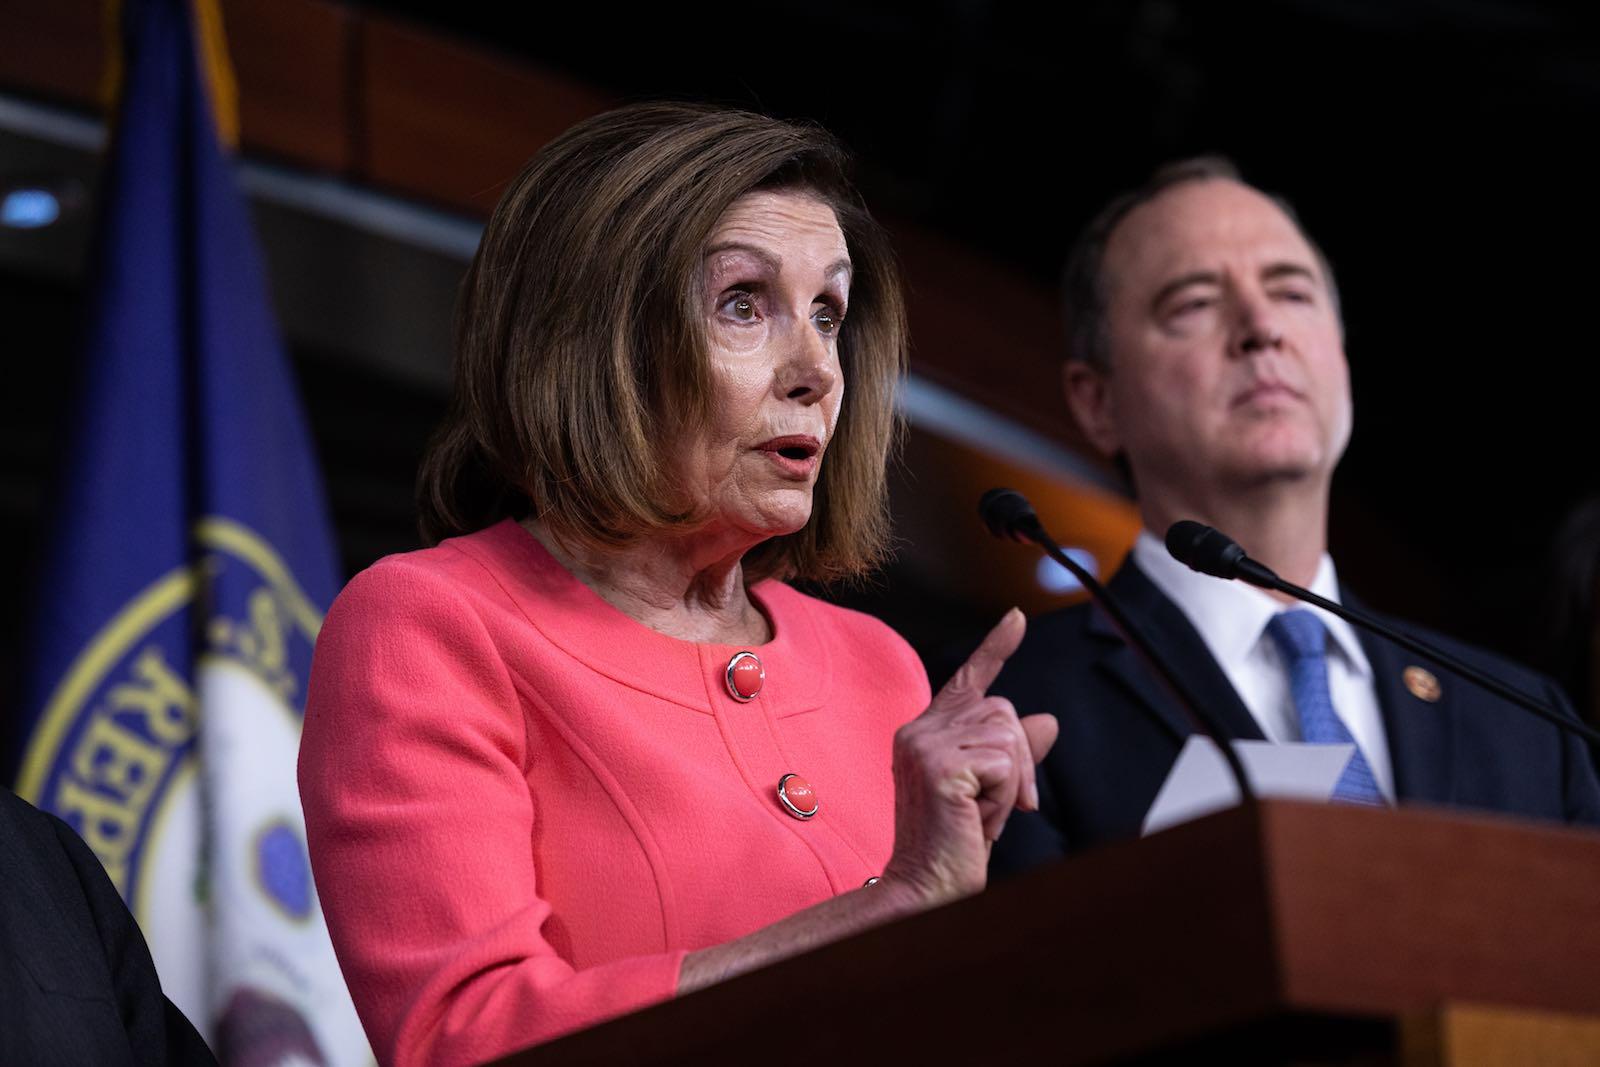 US House Speaker Nancy Pelosi announces vote on sending impeachment articles to the Senate, while Rep. Adam Schiff looks on (Photo: Aurora Samperio/NurPhoto via Getty Images)